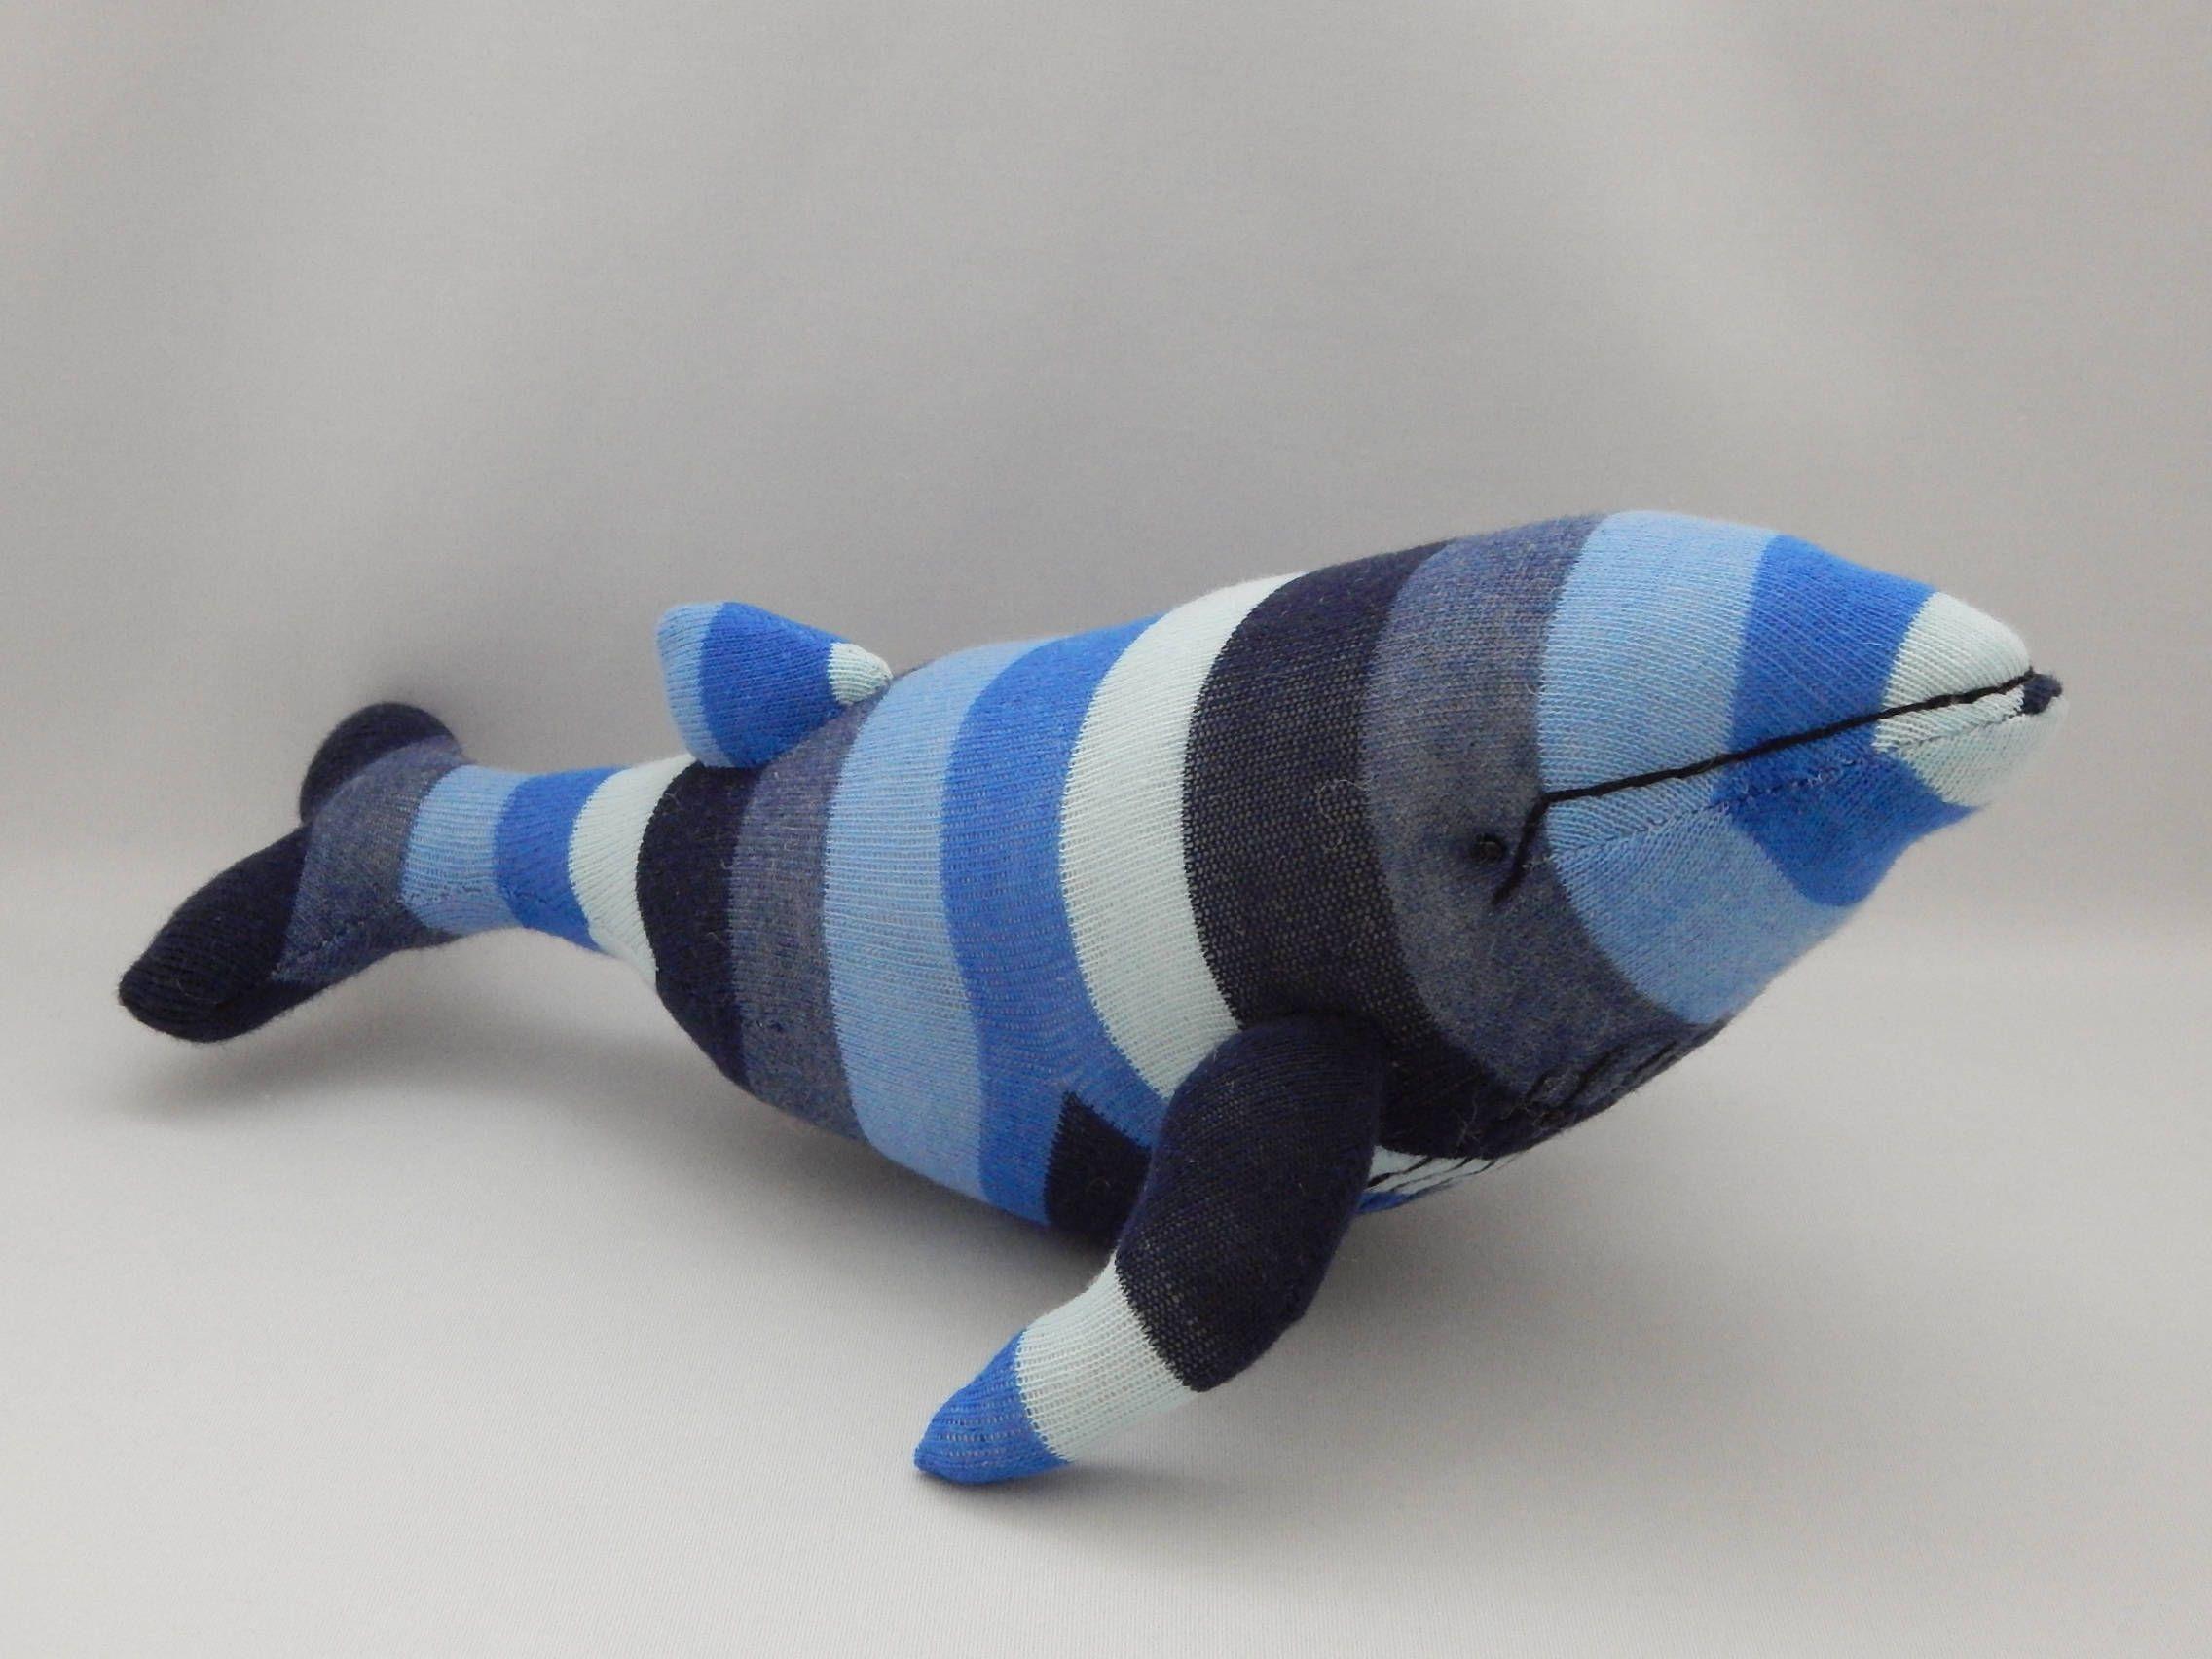 Humpback Whale Plush Toy Whale Stuffed Animal Whale Stuffed Toy